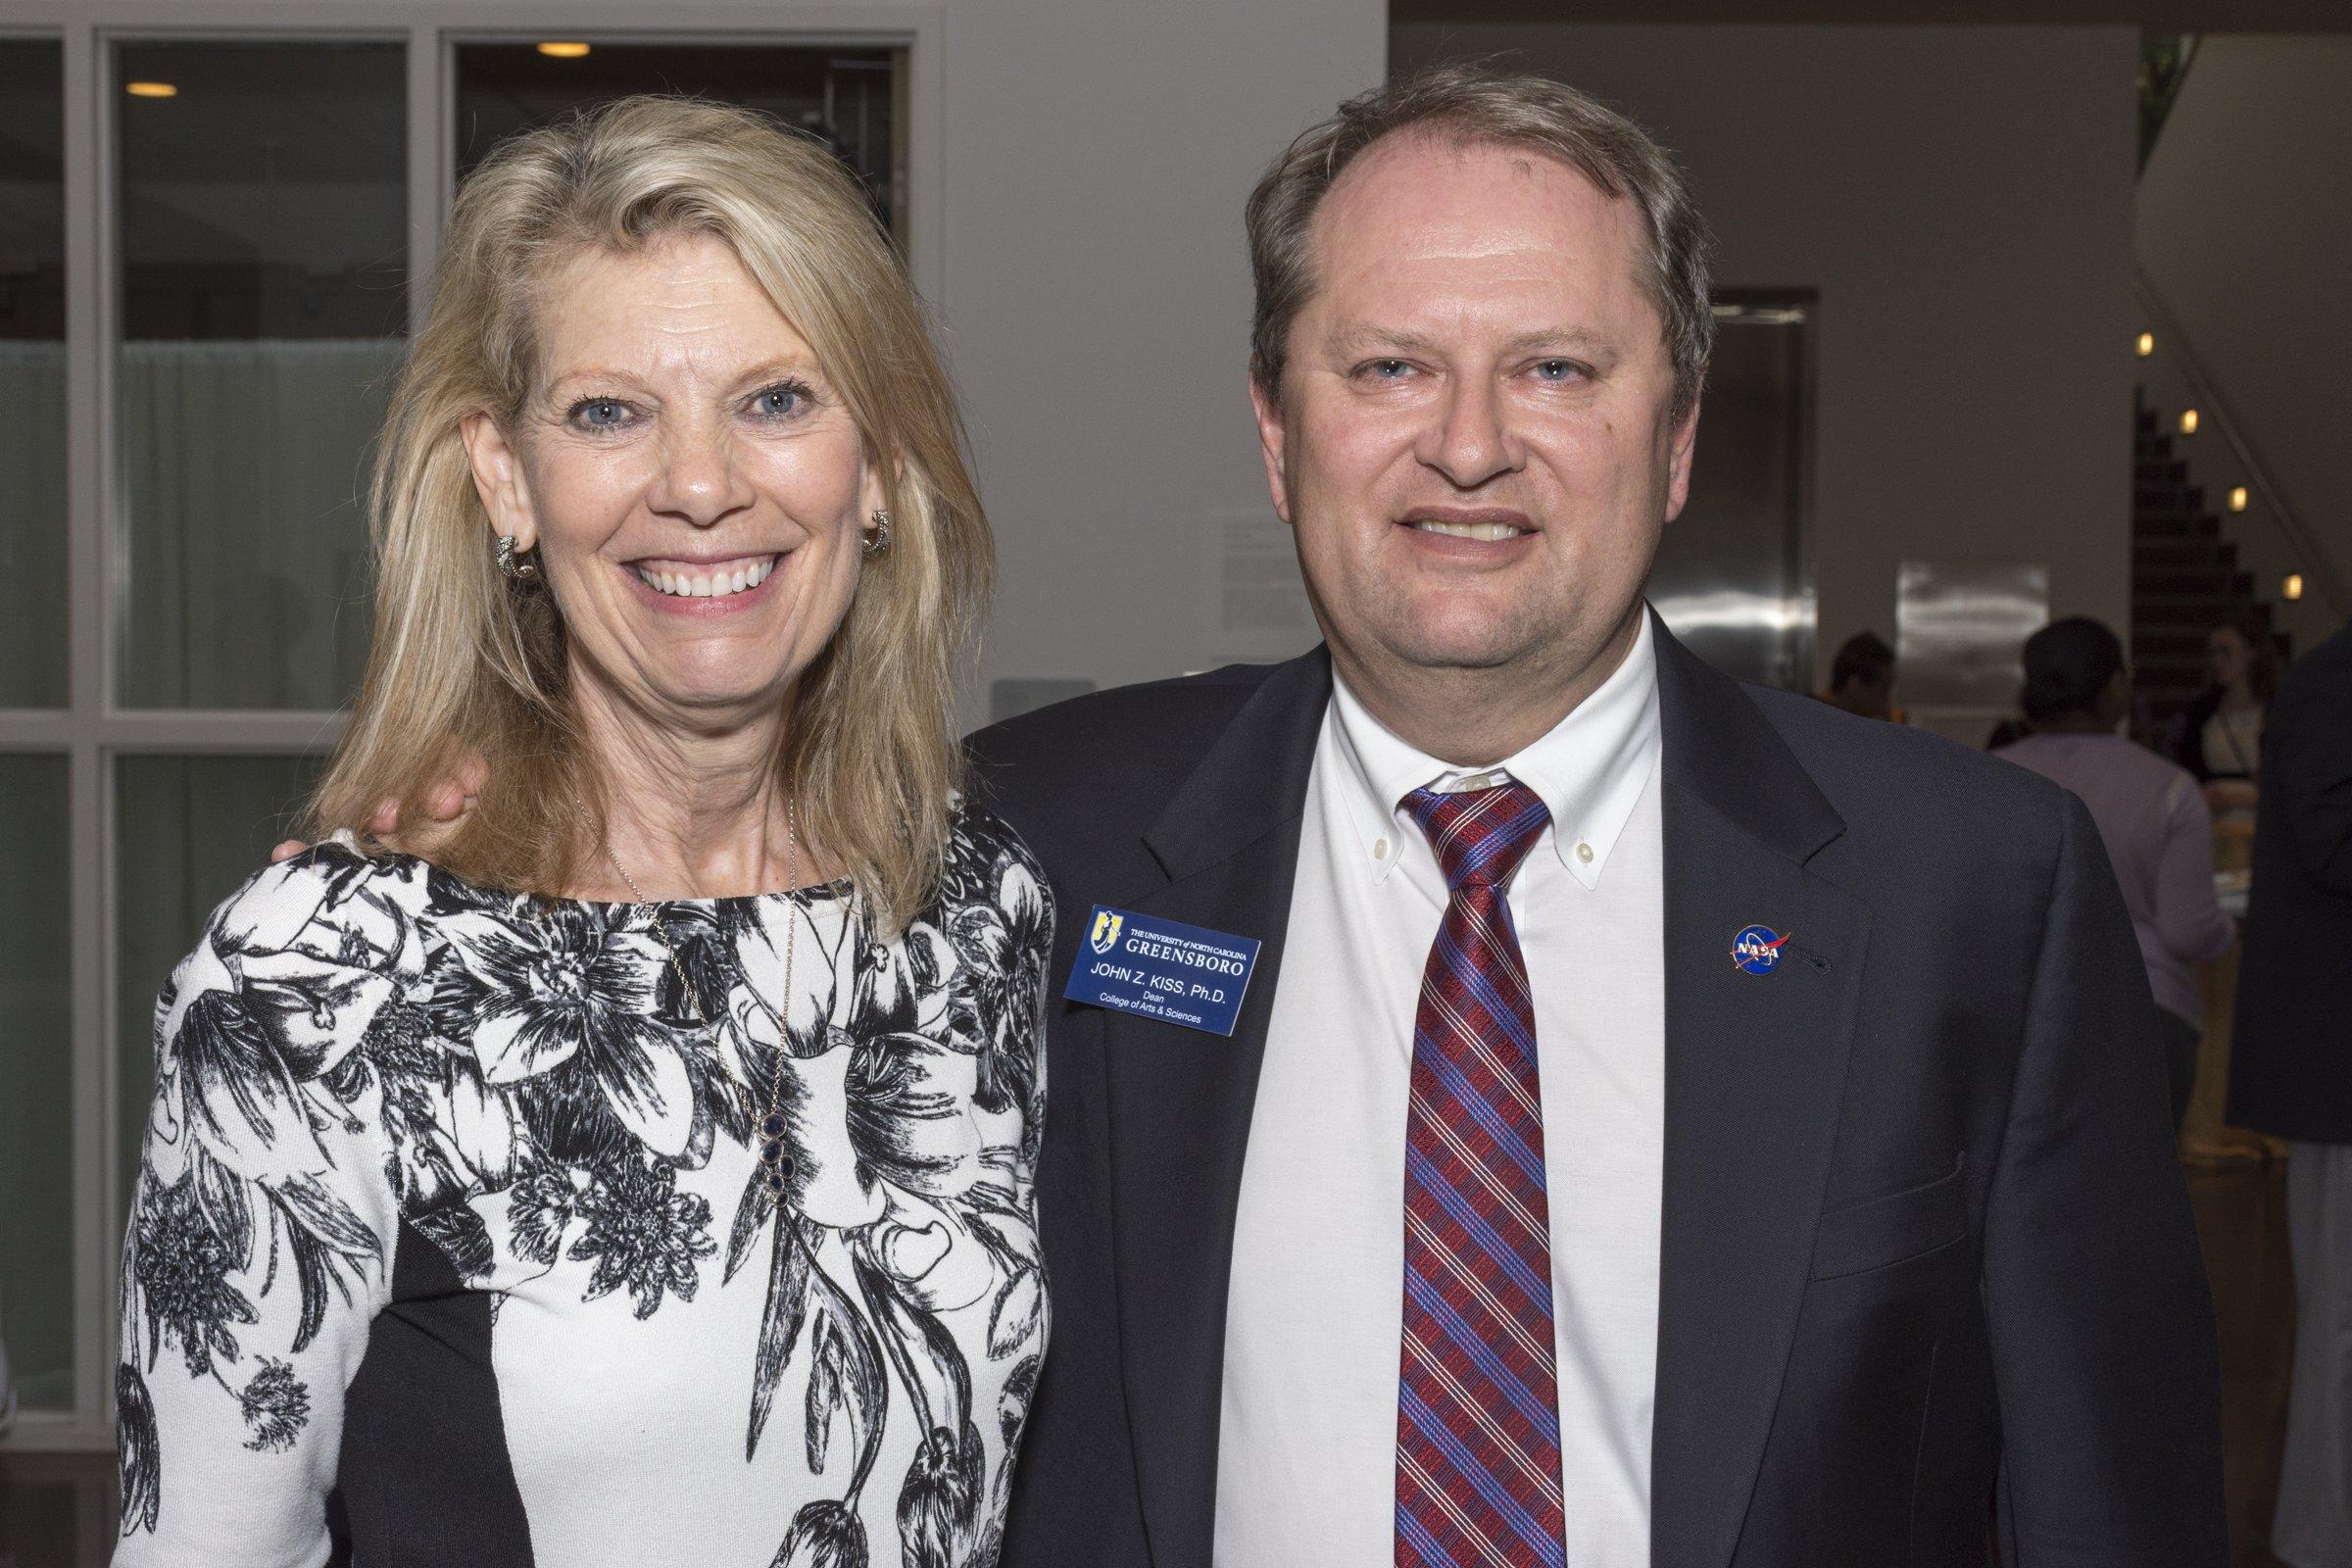 Dr. Terri Shelton with Dean Kiss